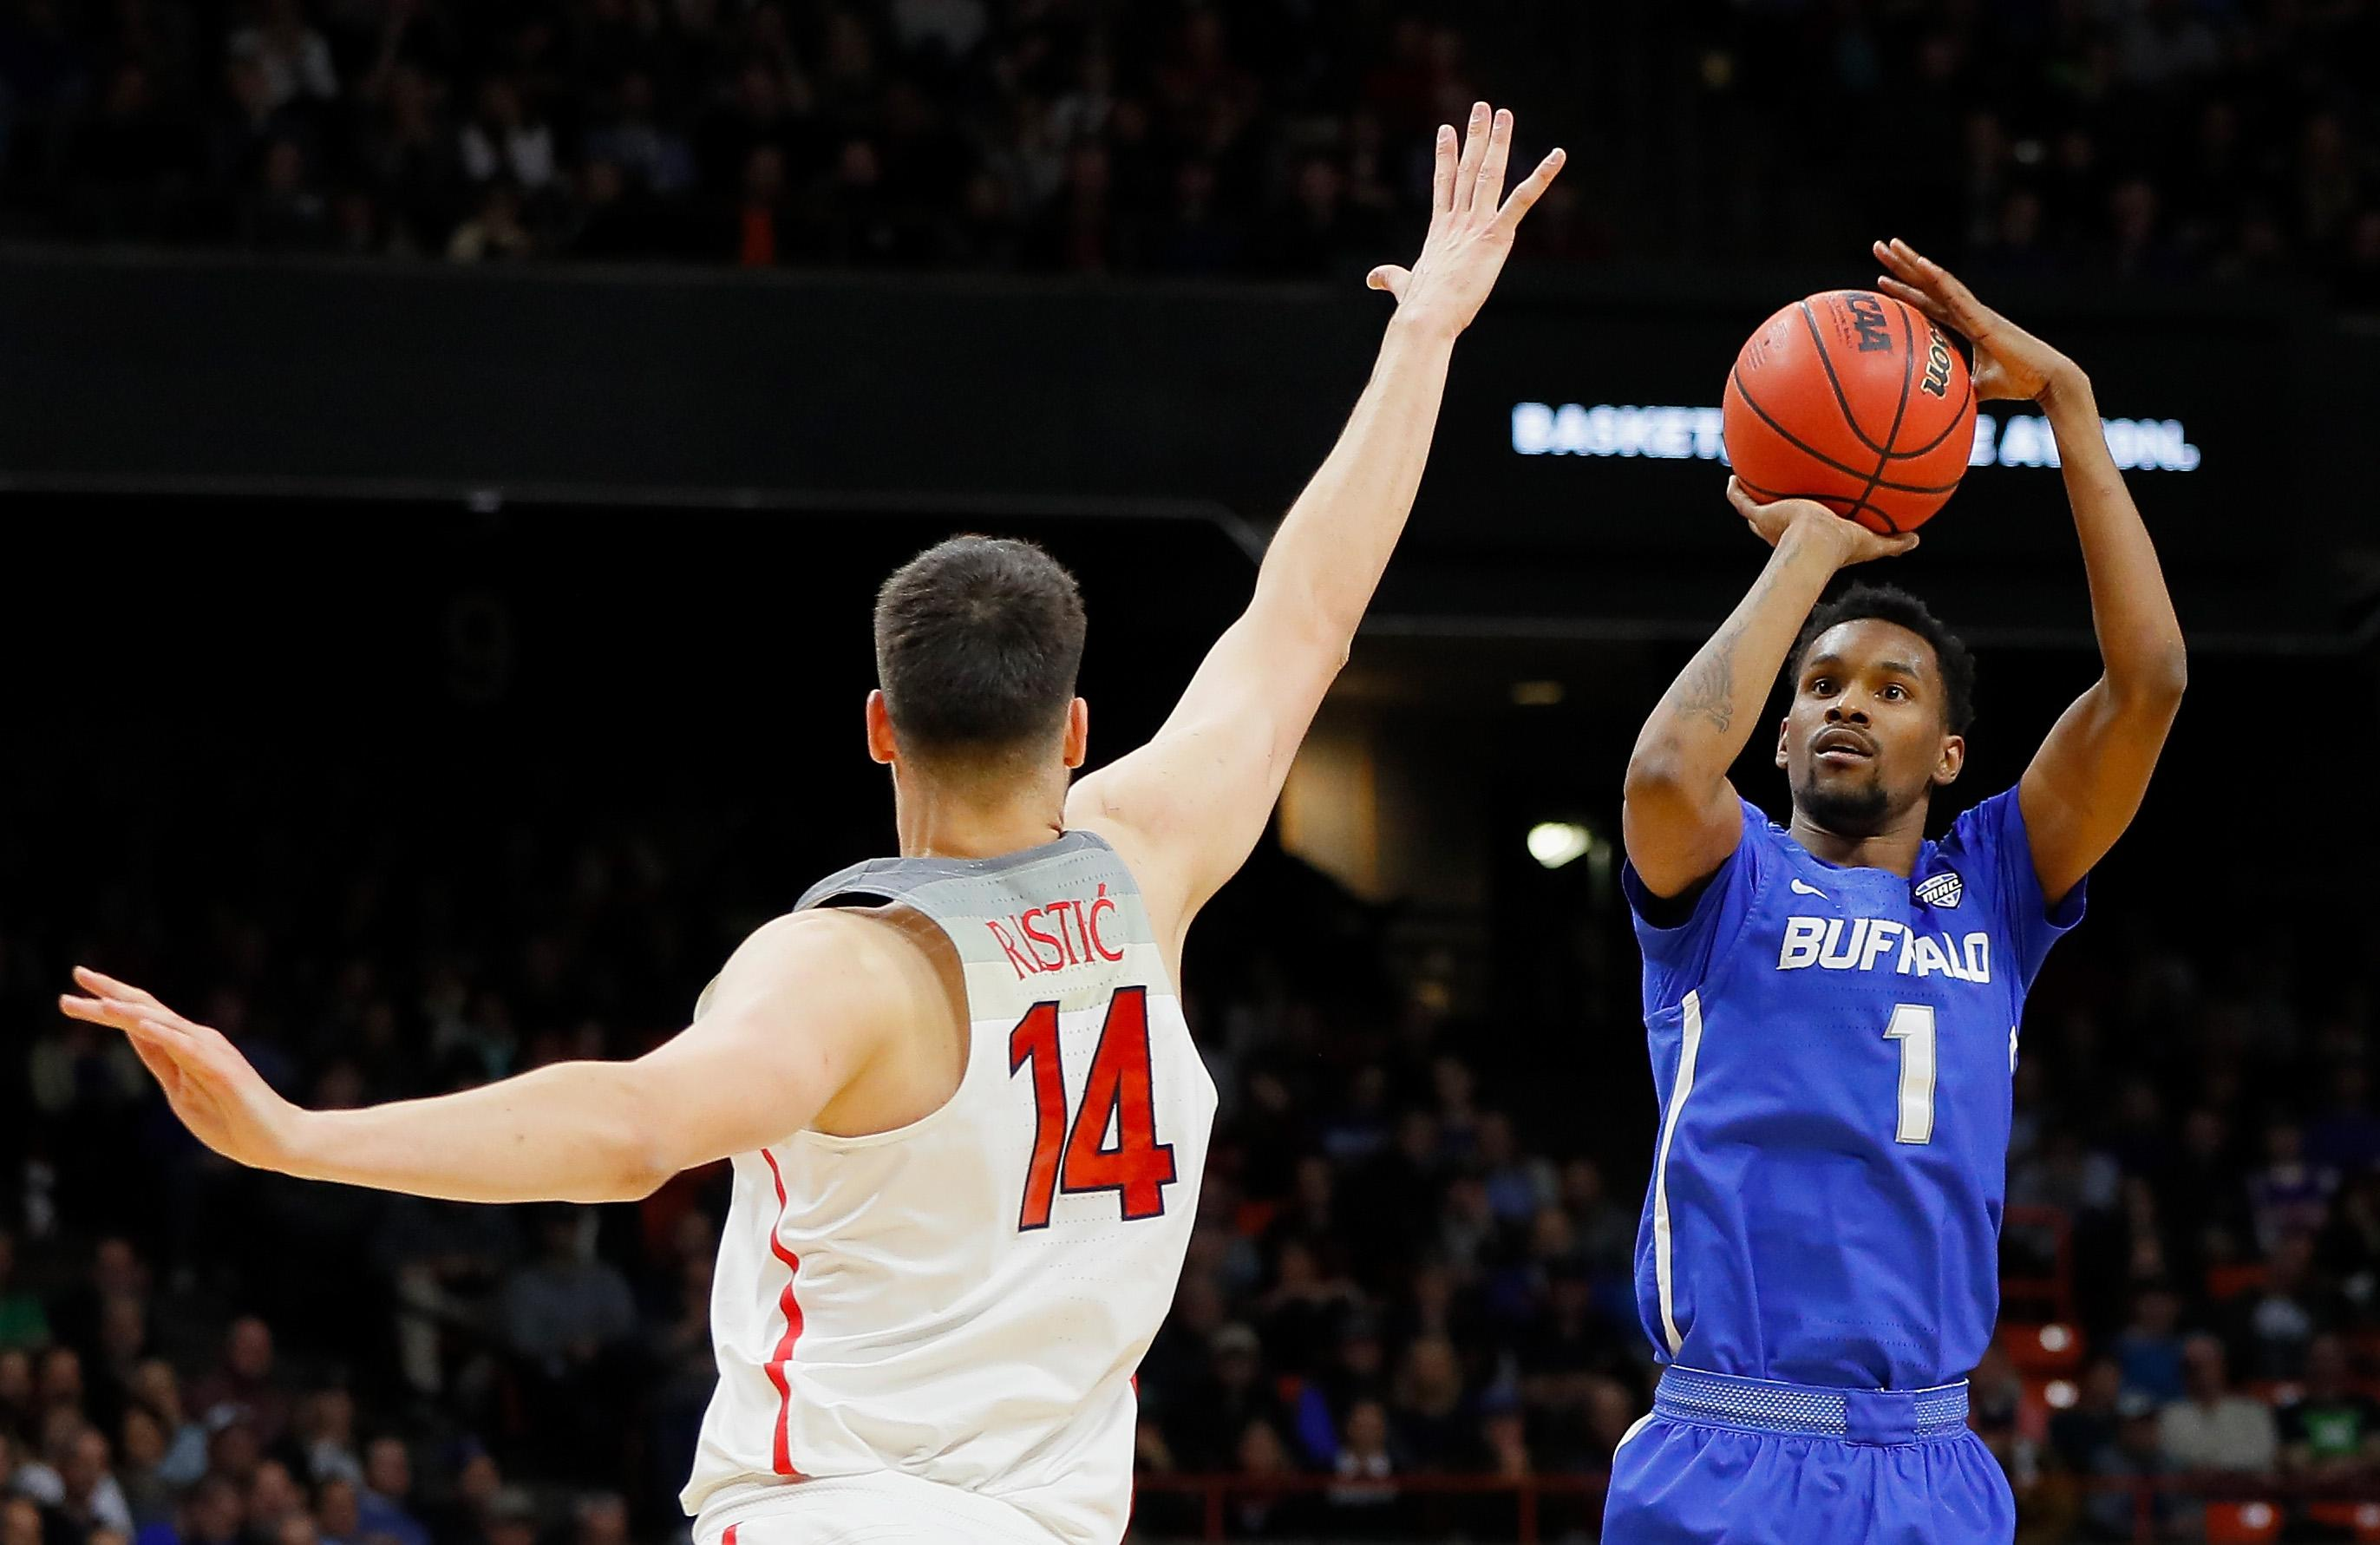 Buffalo ends Arizona's strange season with resounding NCAA tournament upset